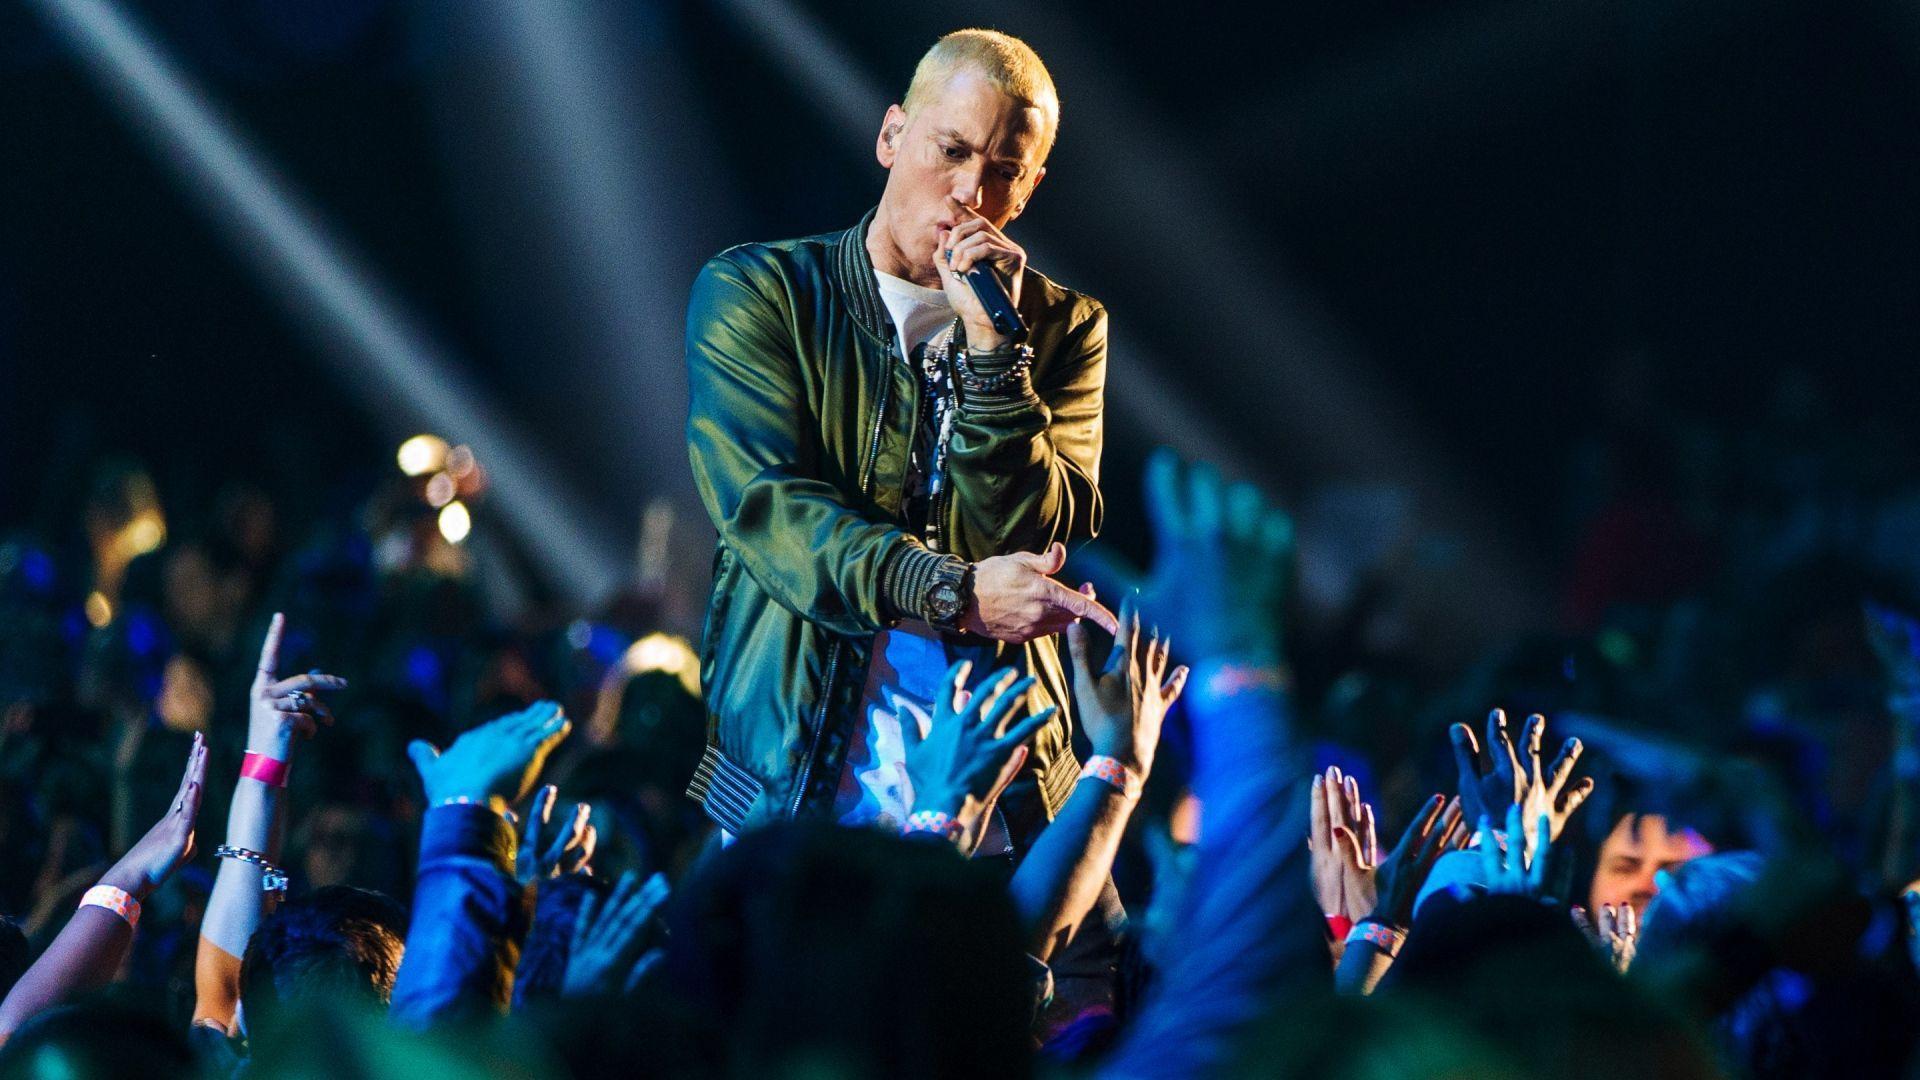 Eminem Wallpapers HD 2016 1920x1080